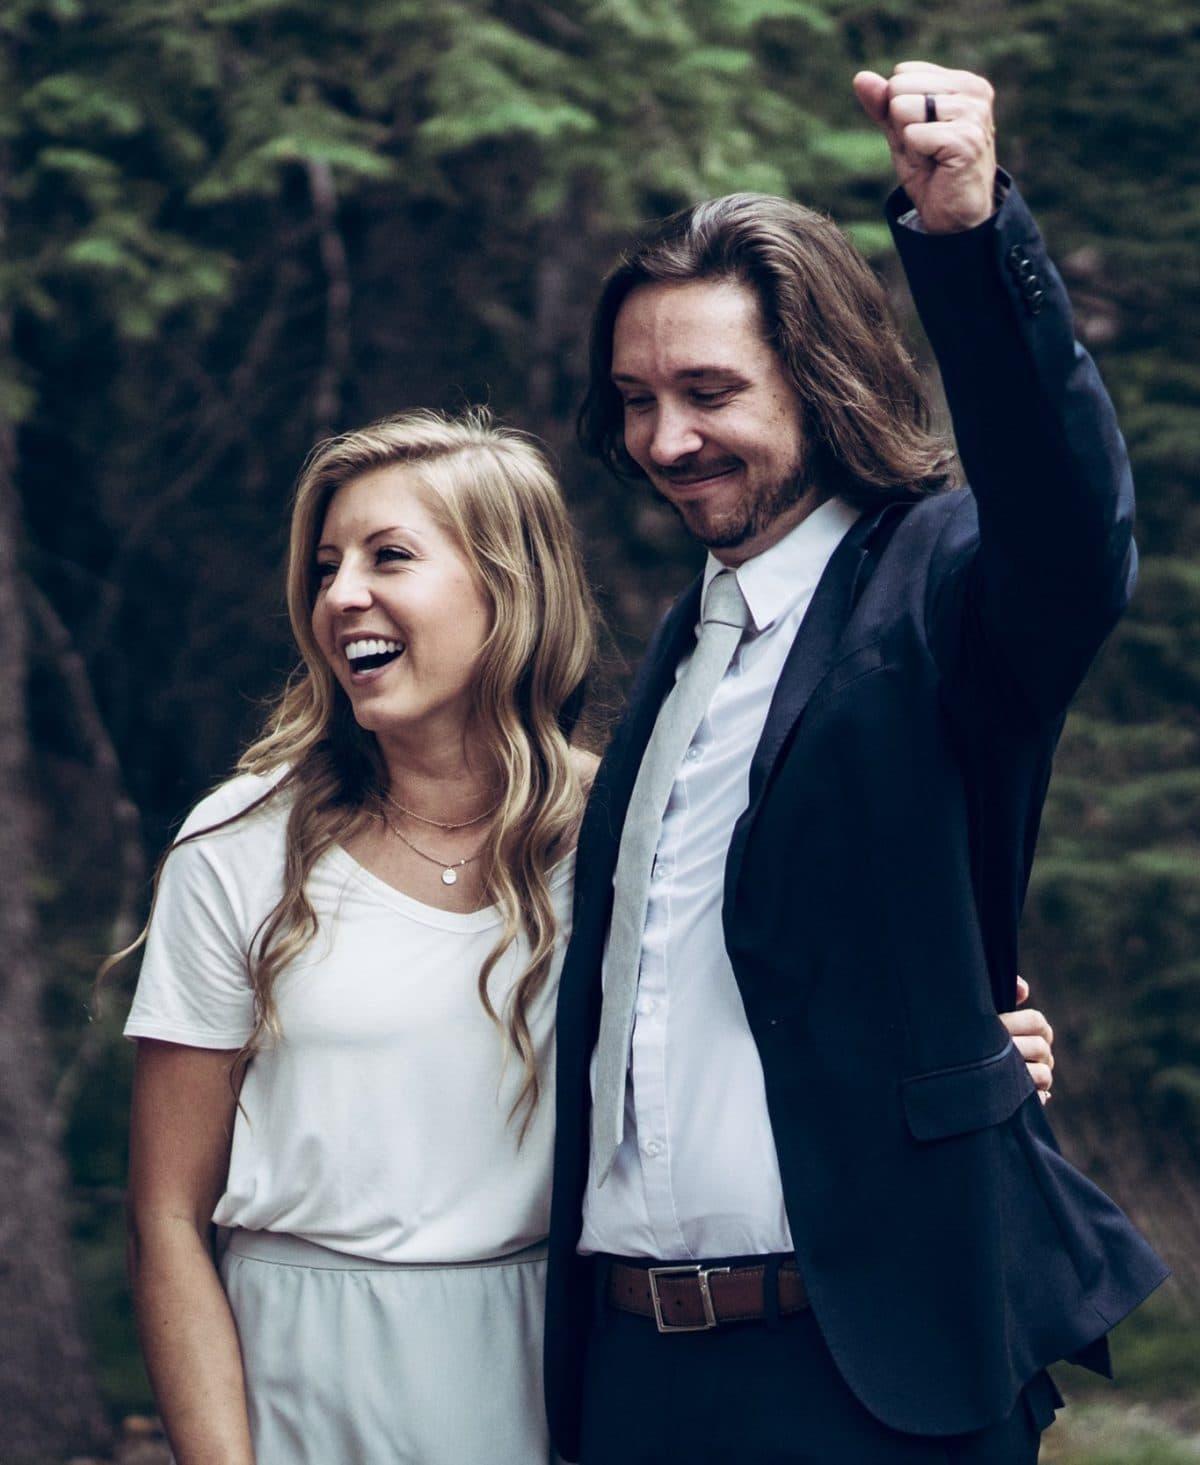 Amy Moffatt and Stephen Graham